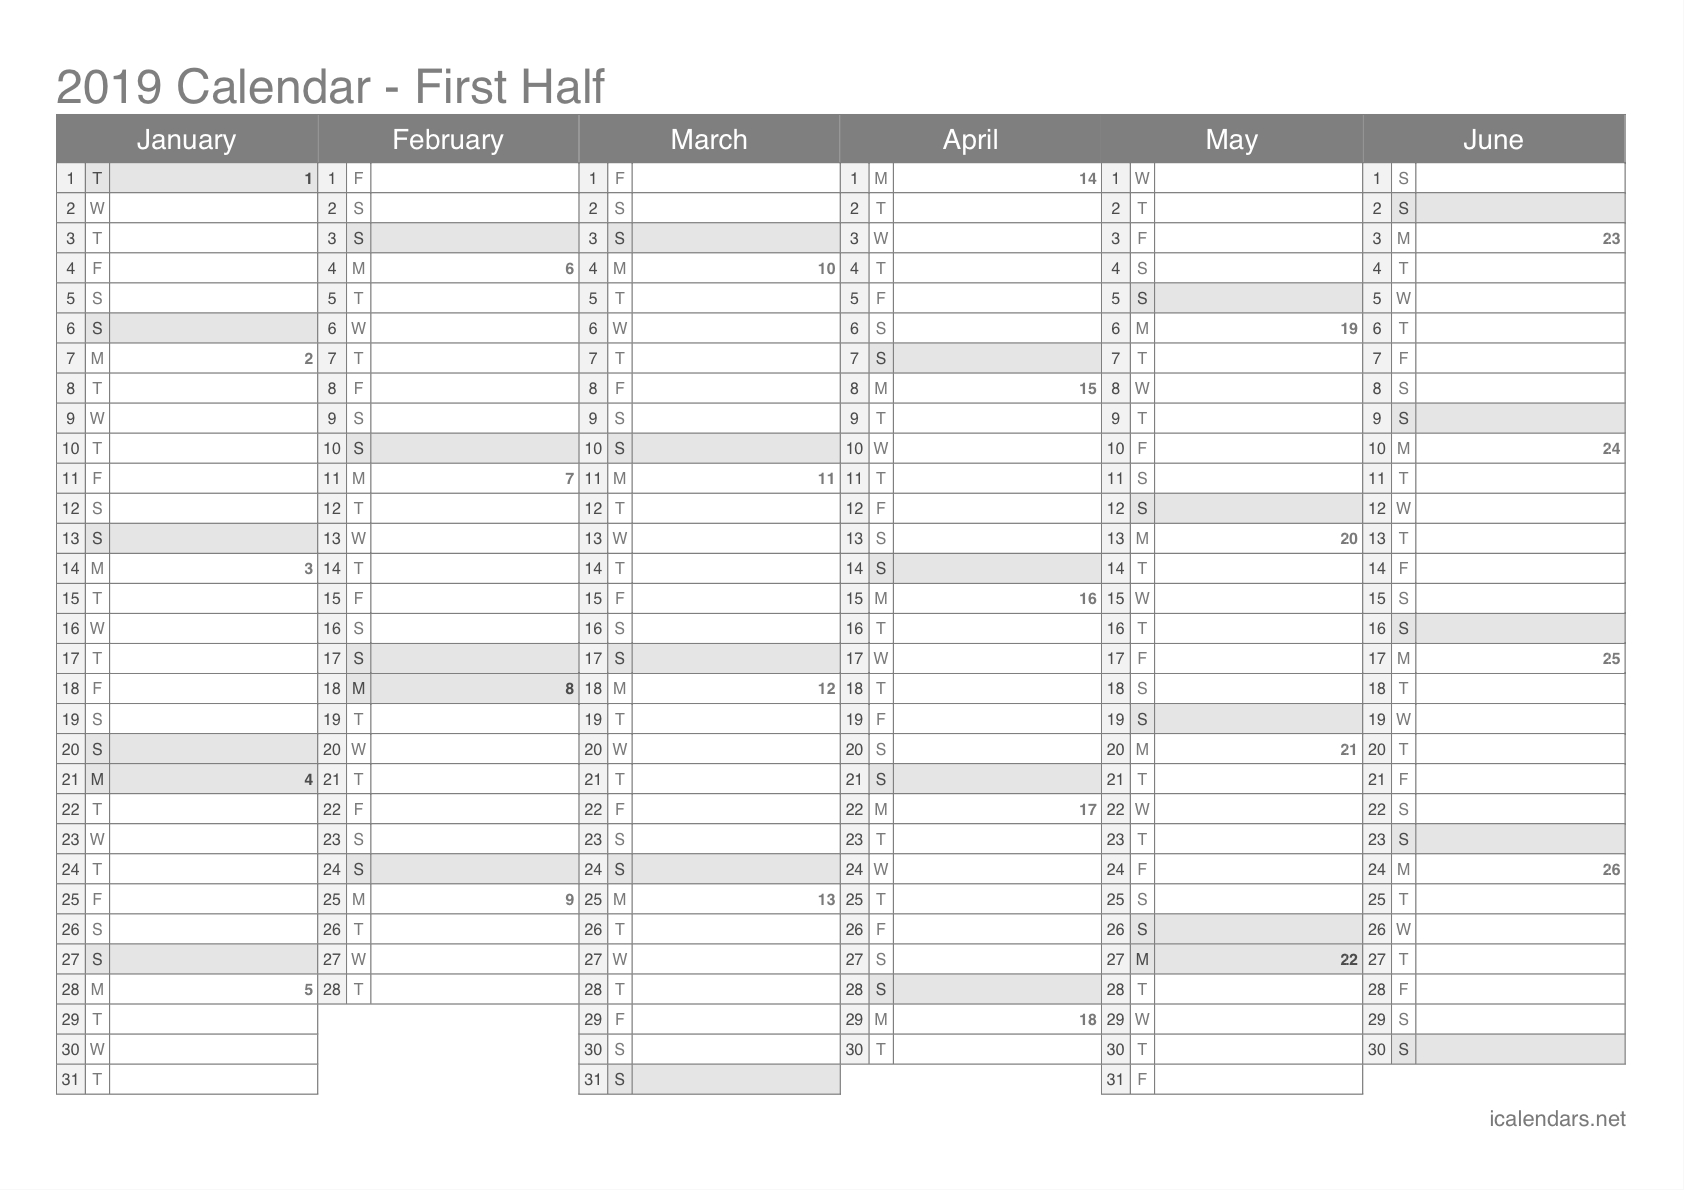 2019 Printable Calendar - Pdf Or Excel - Icalendars